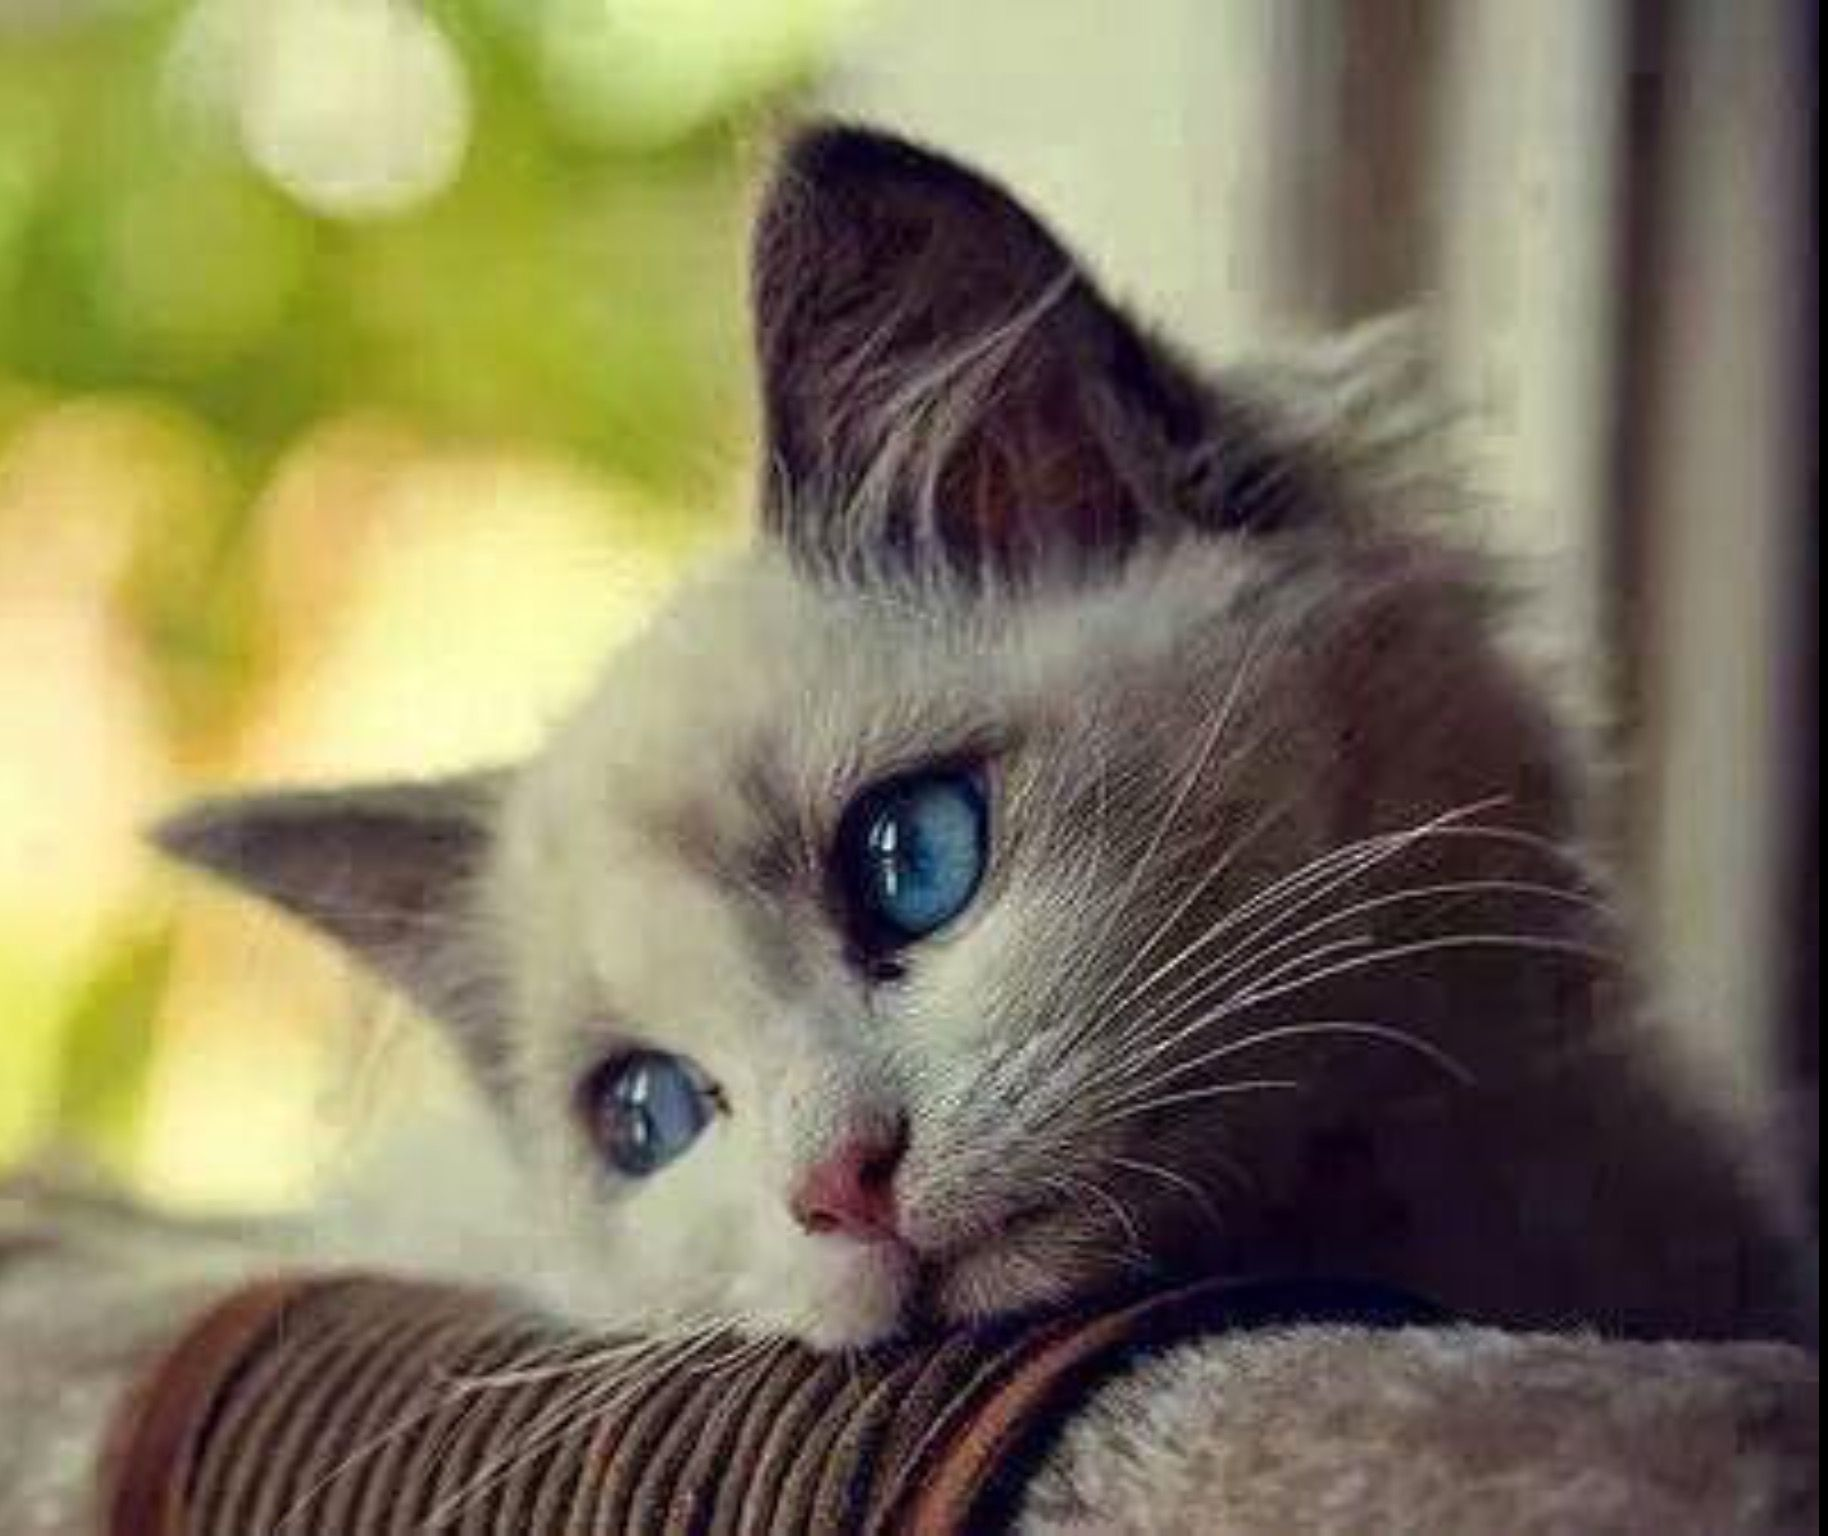 Pin By Linda Bengtson On Syya ƒyyayau ƒyaiyeh ѕ Cats American Bobtail Cat Cat Eye Discharge